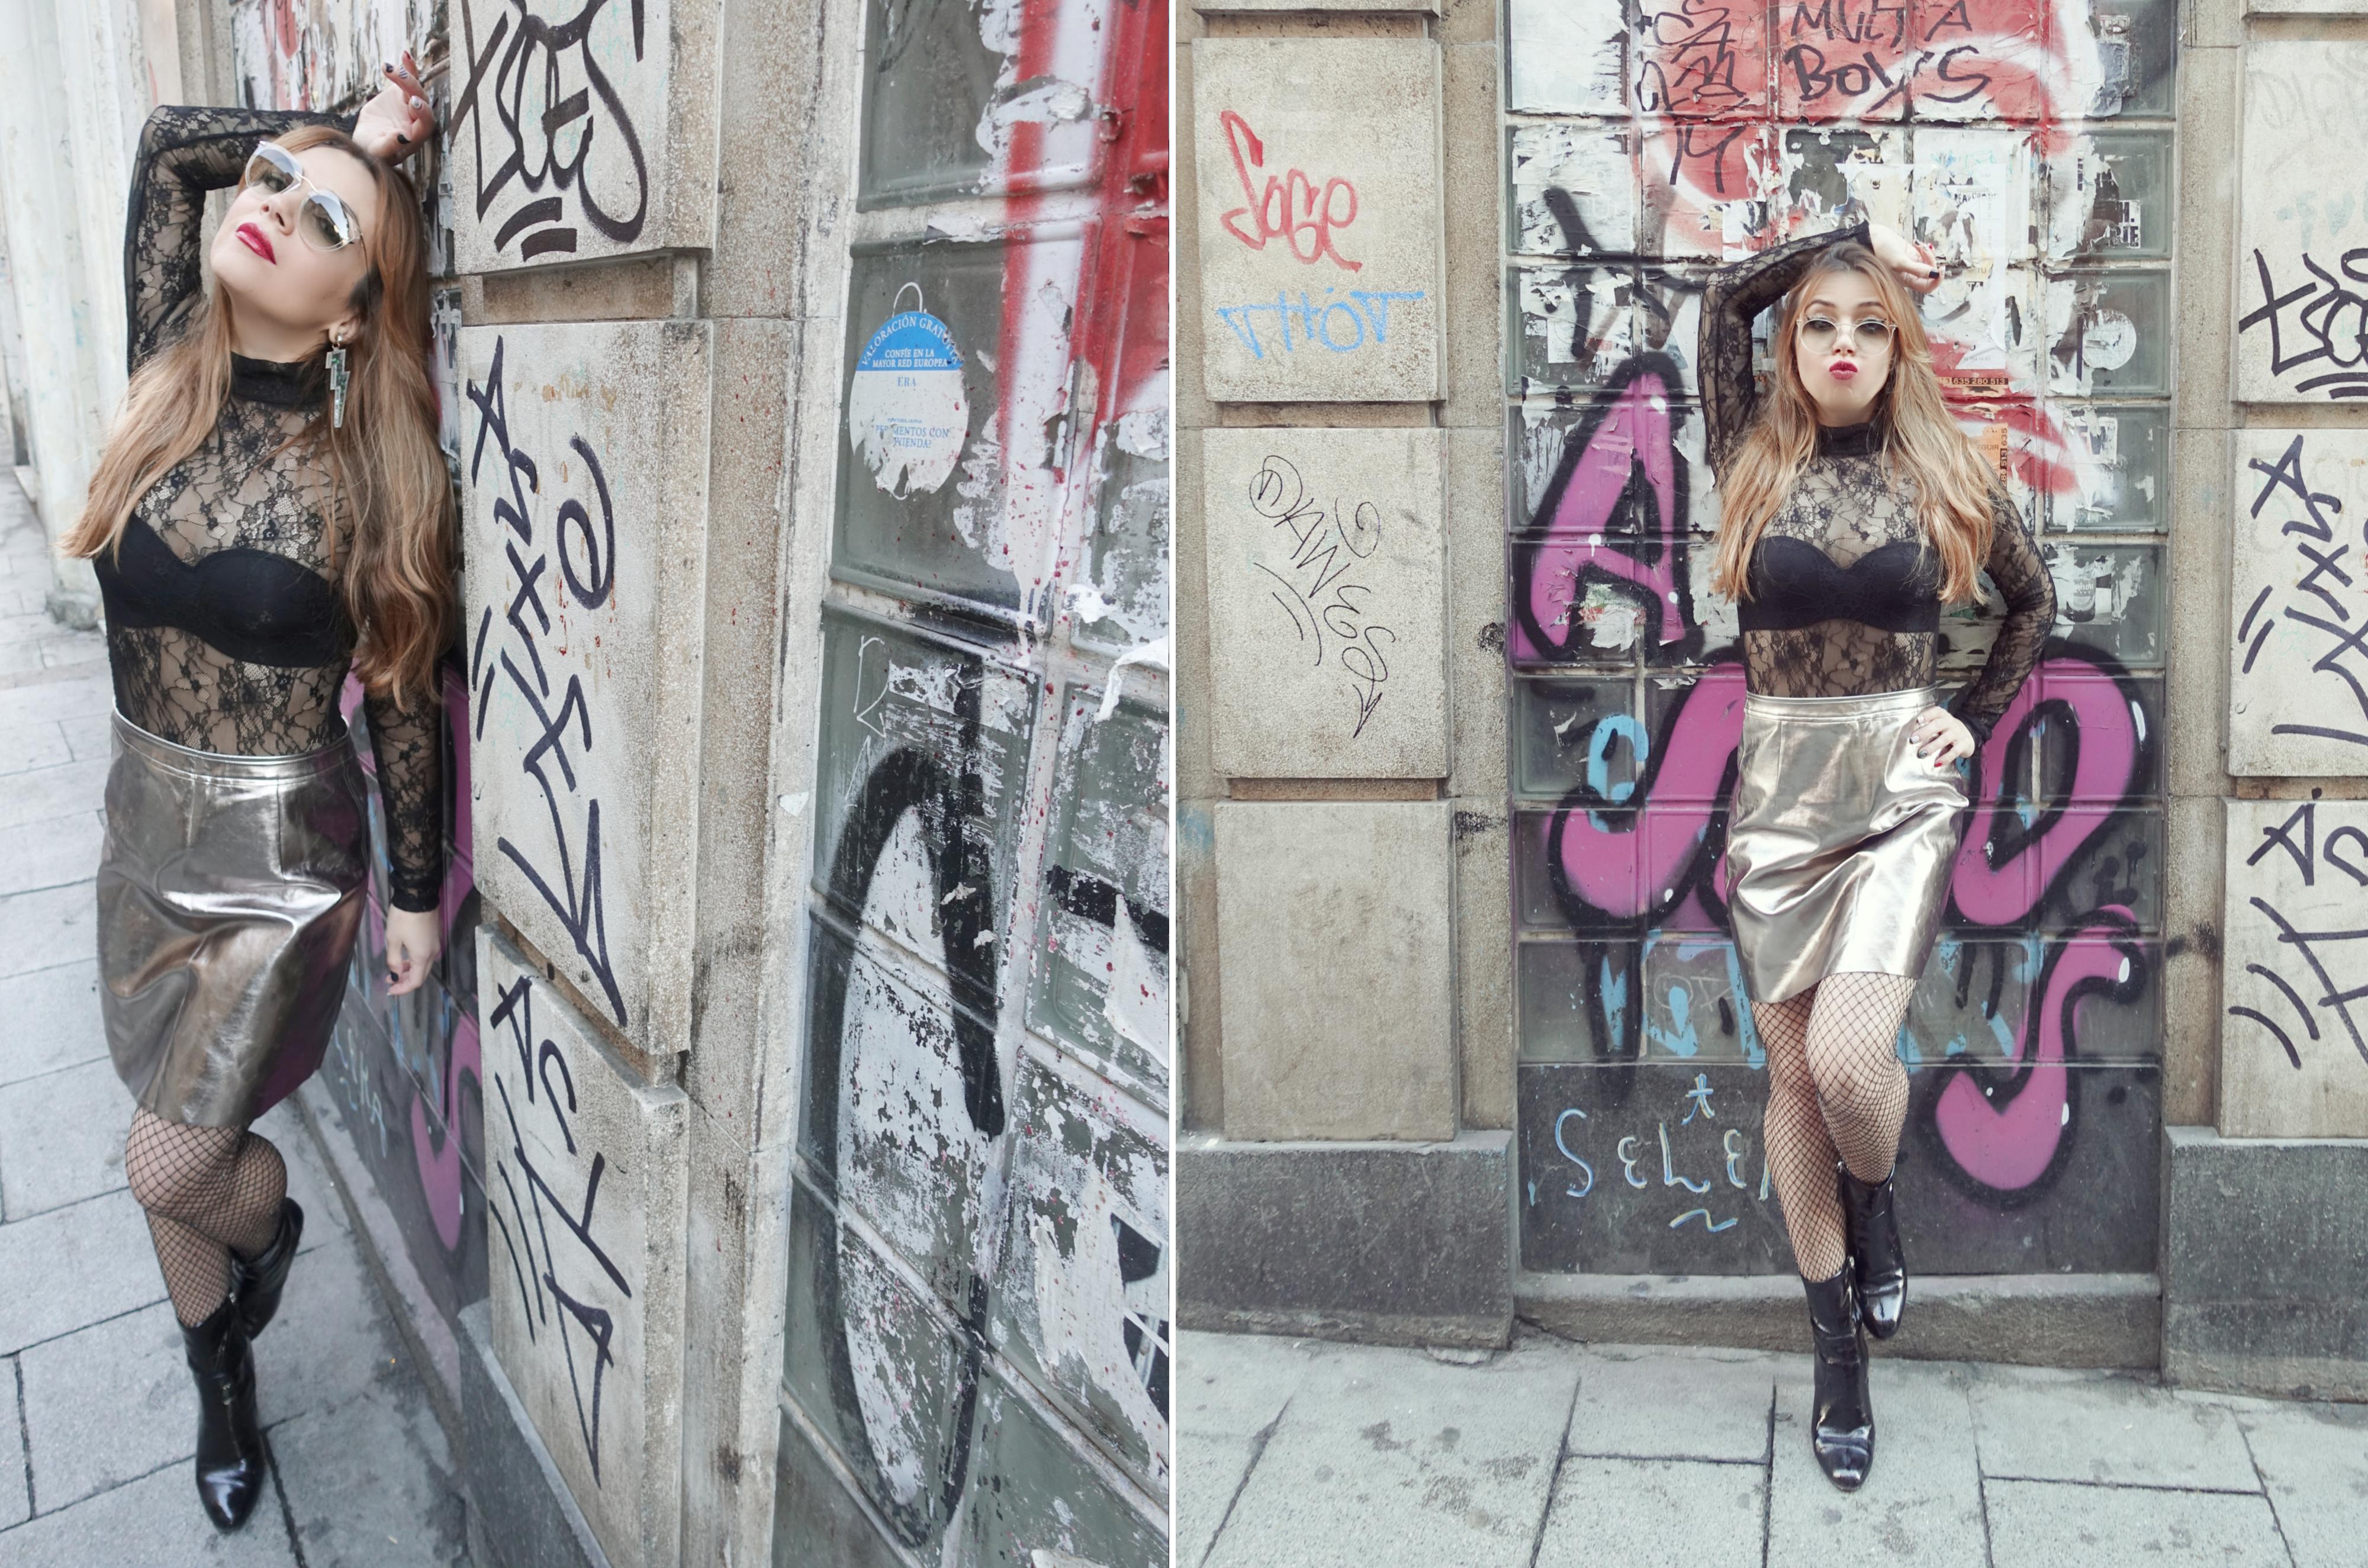 Looks-para-noche-vieja-blog-de-moda-Chicadicta-influencer-PiensaenChic-silver-skirt-falda-plateada-mollybracken-Chic-adicta-Piensa-en-Chic